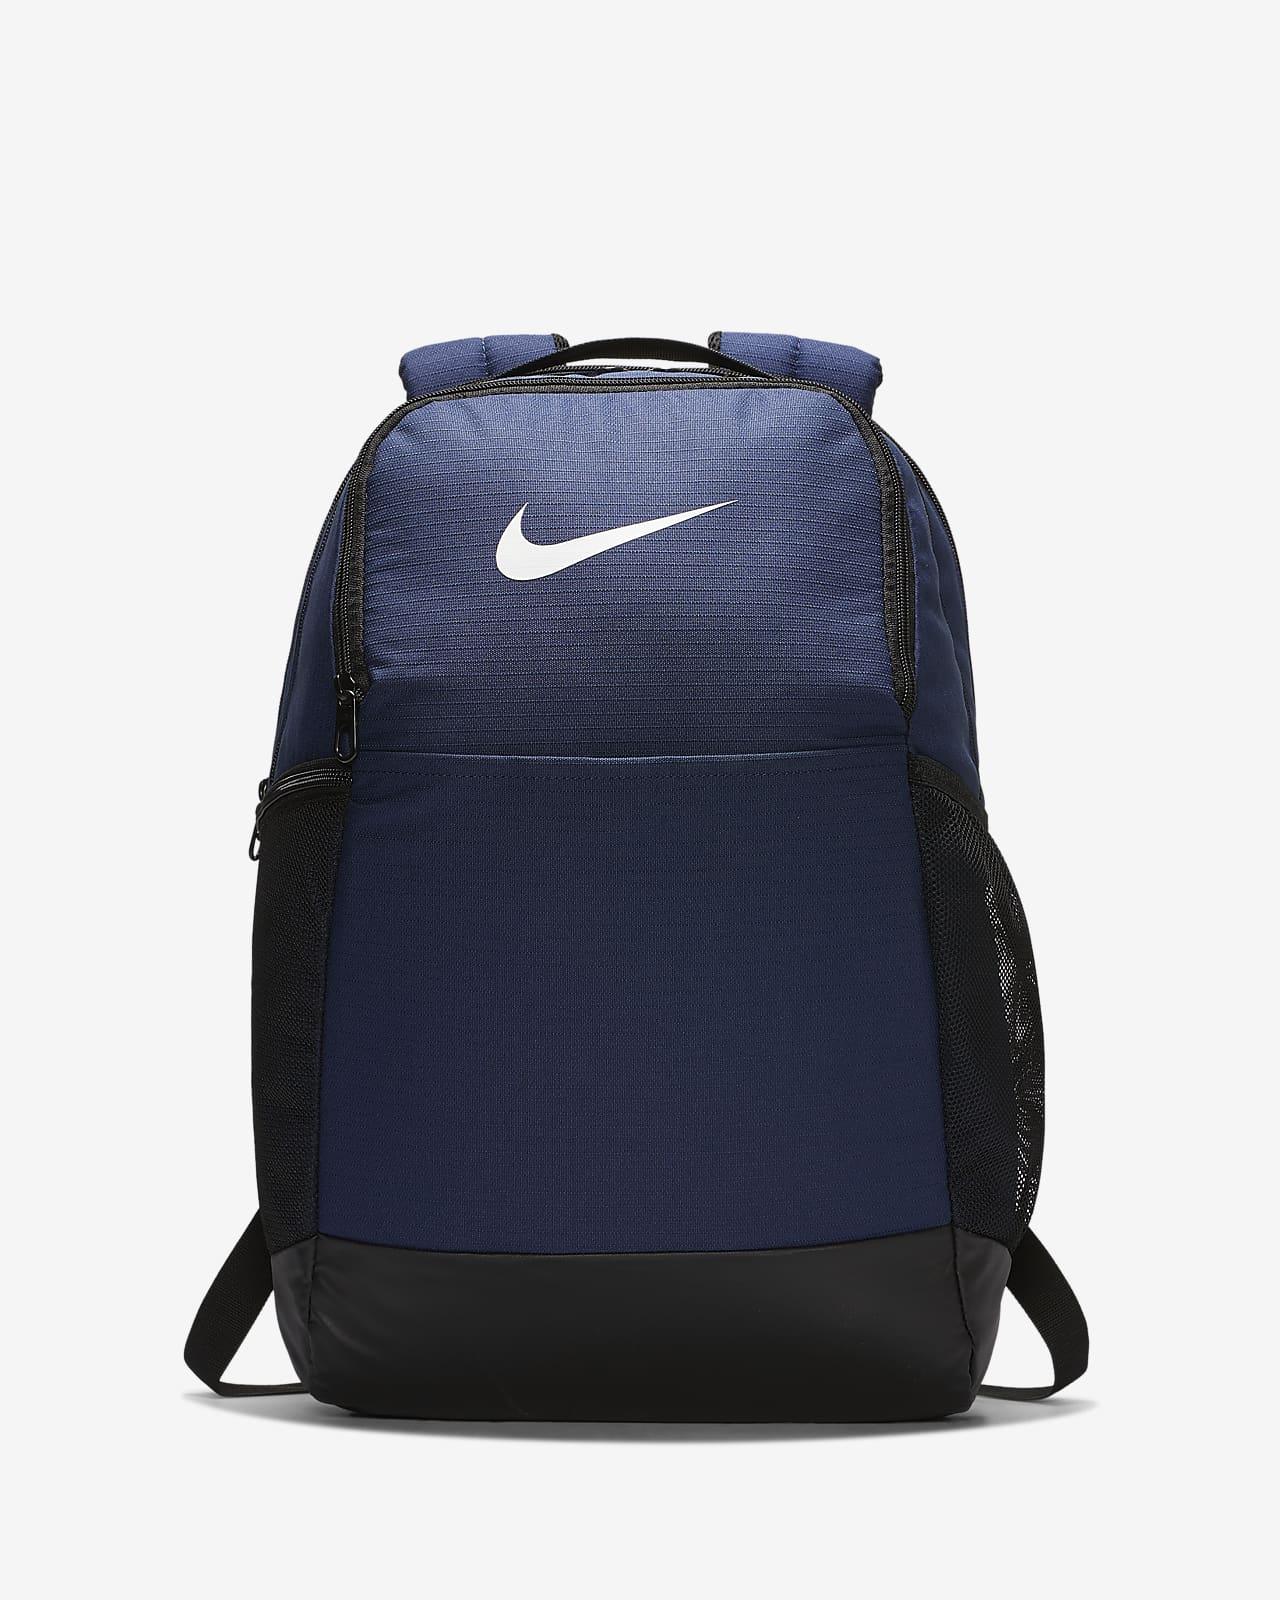 Mochila de treino Nike Brasilia (média)